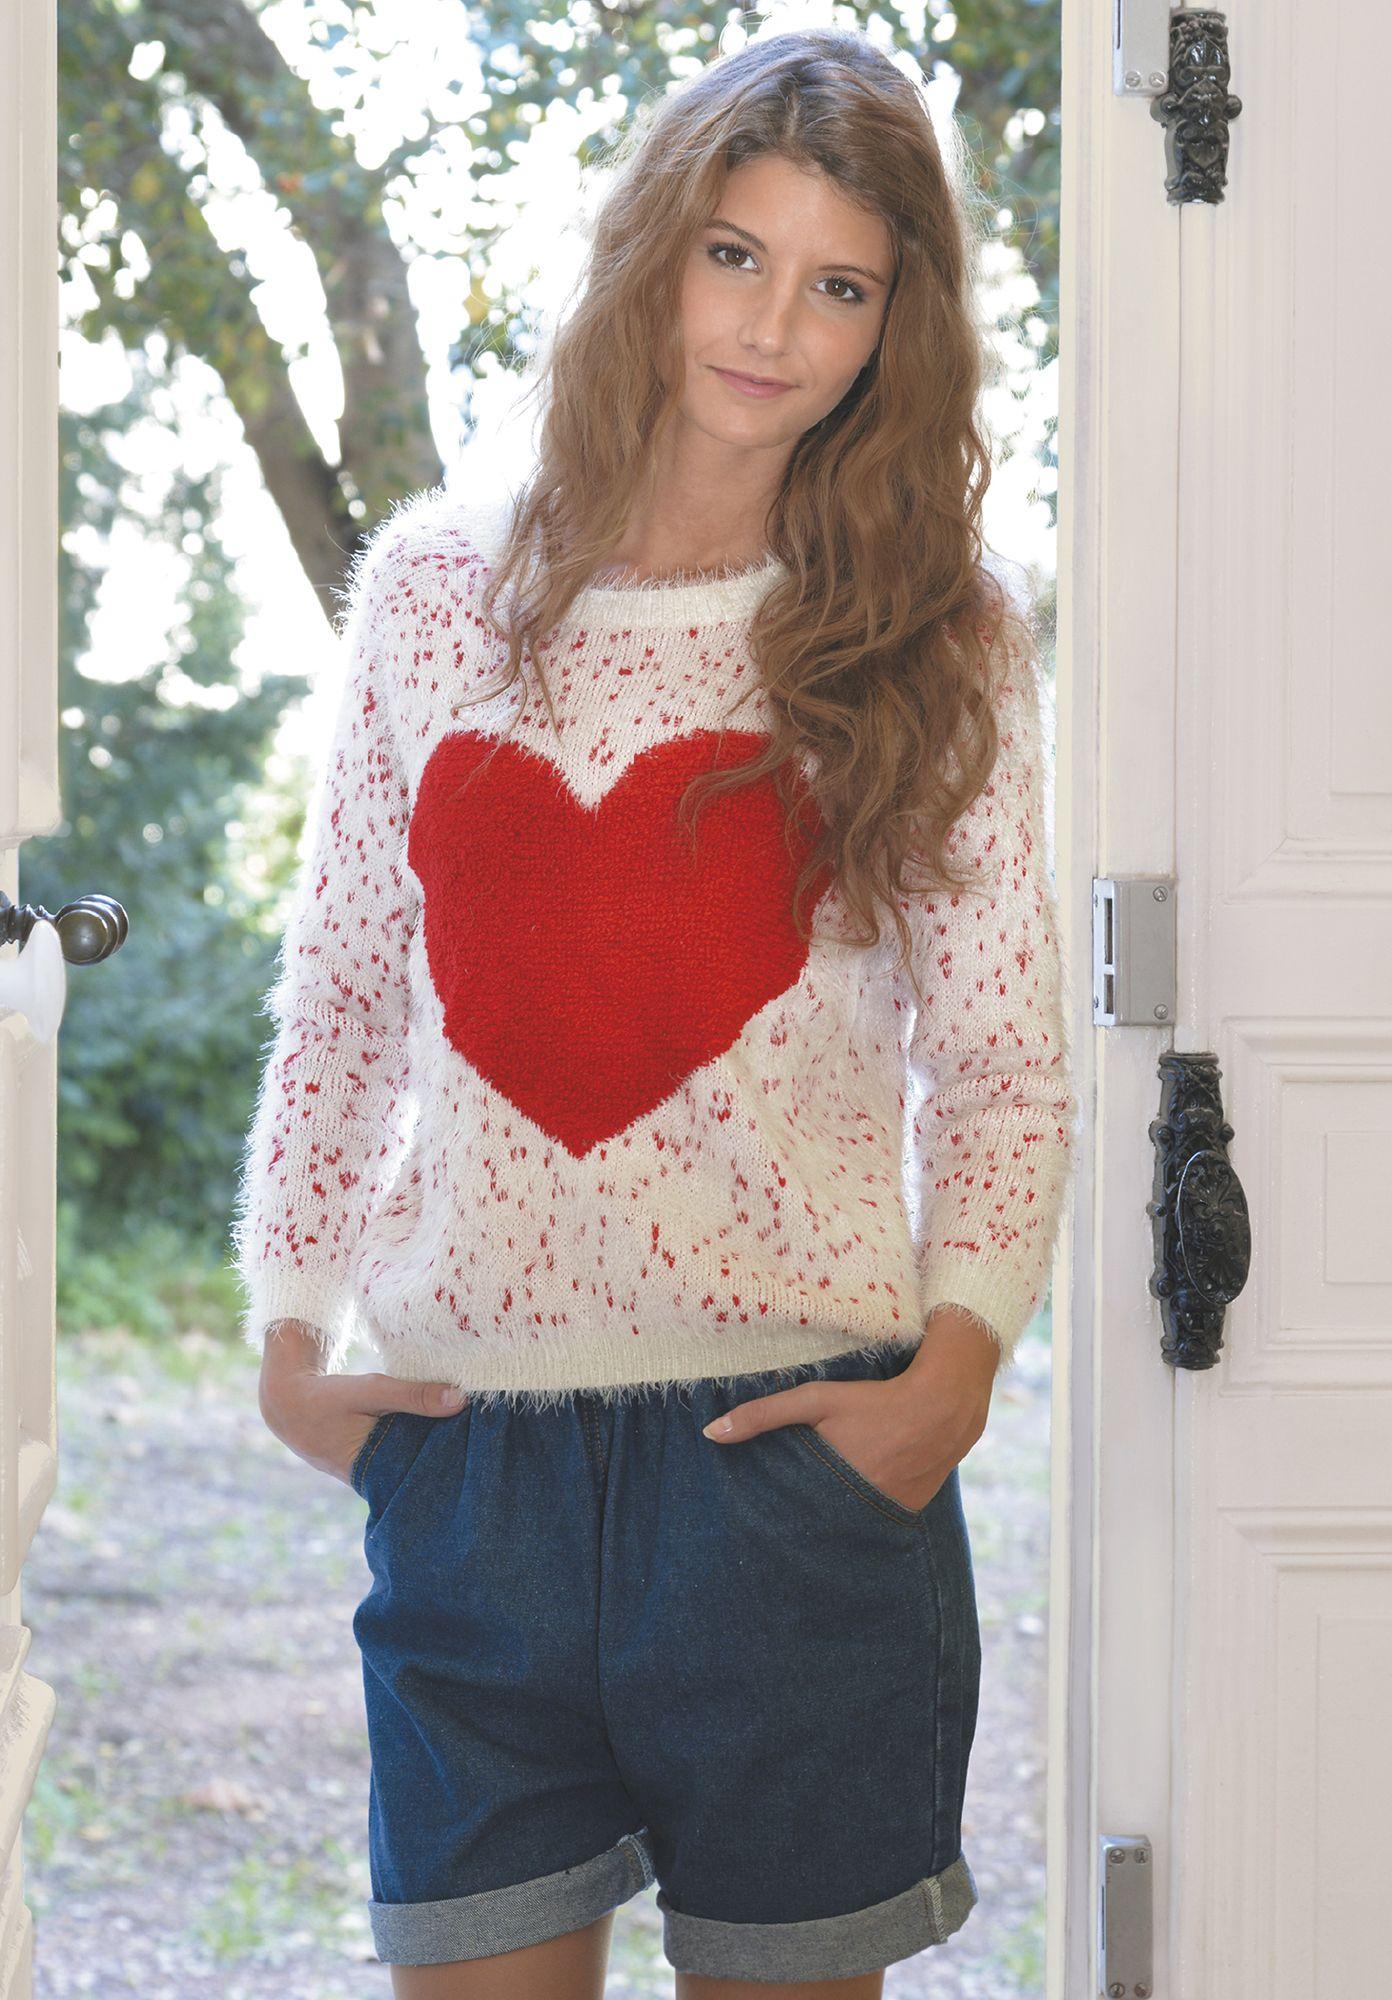 Sweet heart <3 #Mollybracken #Fashion #Cute